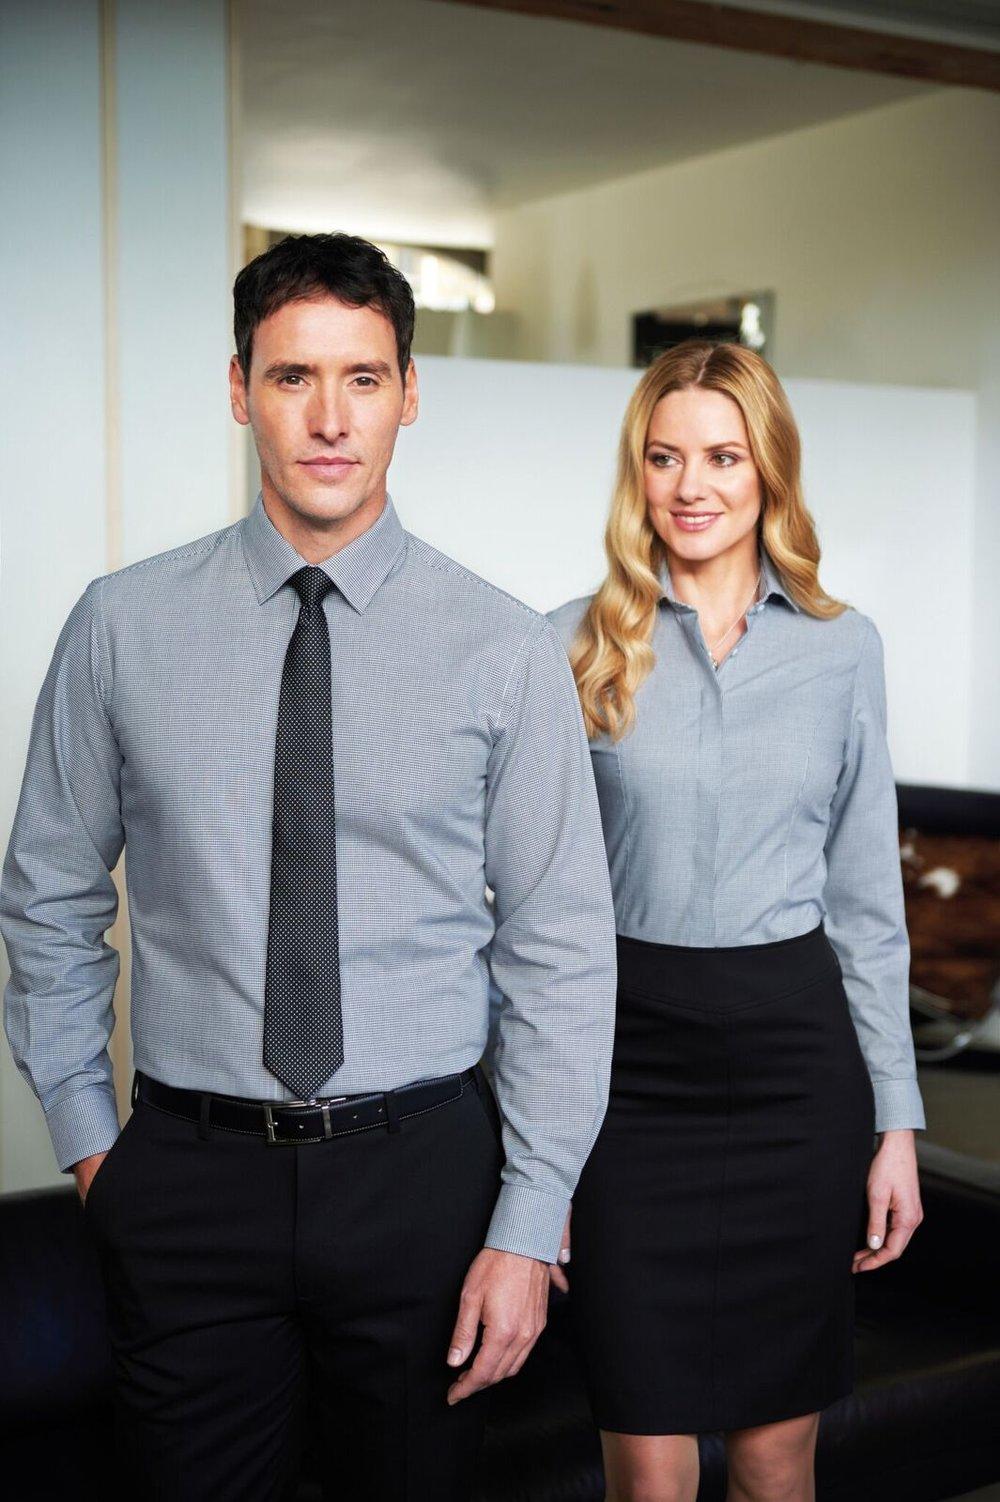 corporate-workwear-uniforms-supplier-red-penguin-malvern-worcster-uk